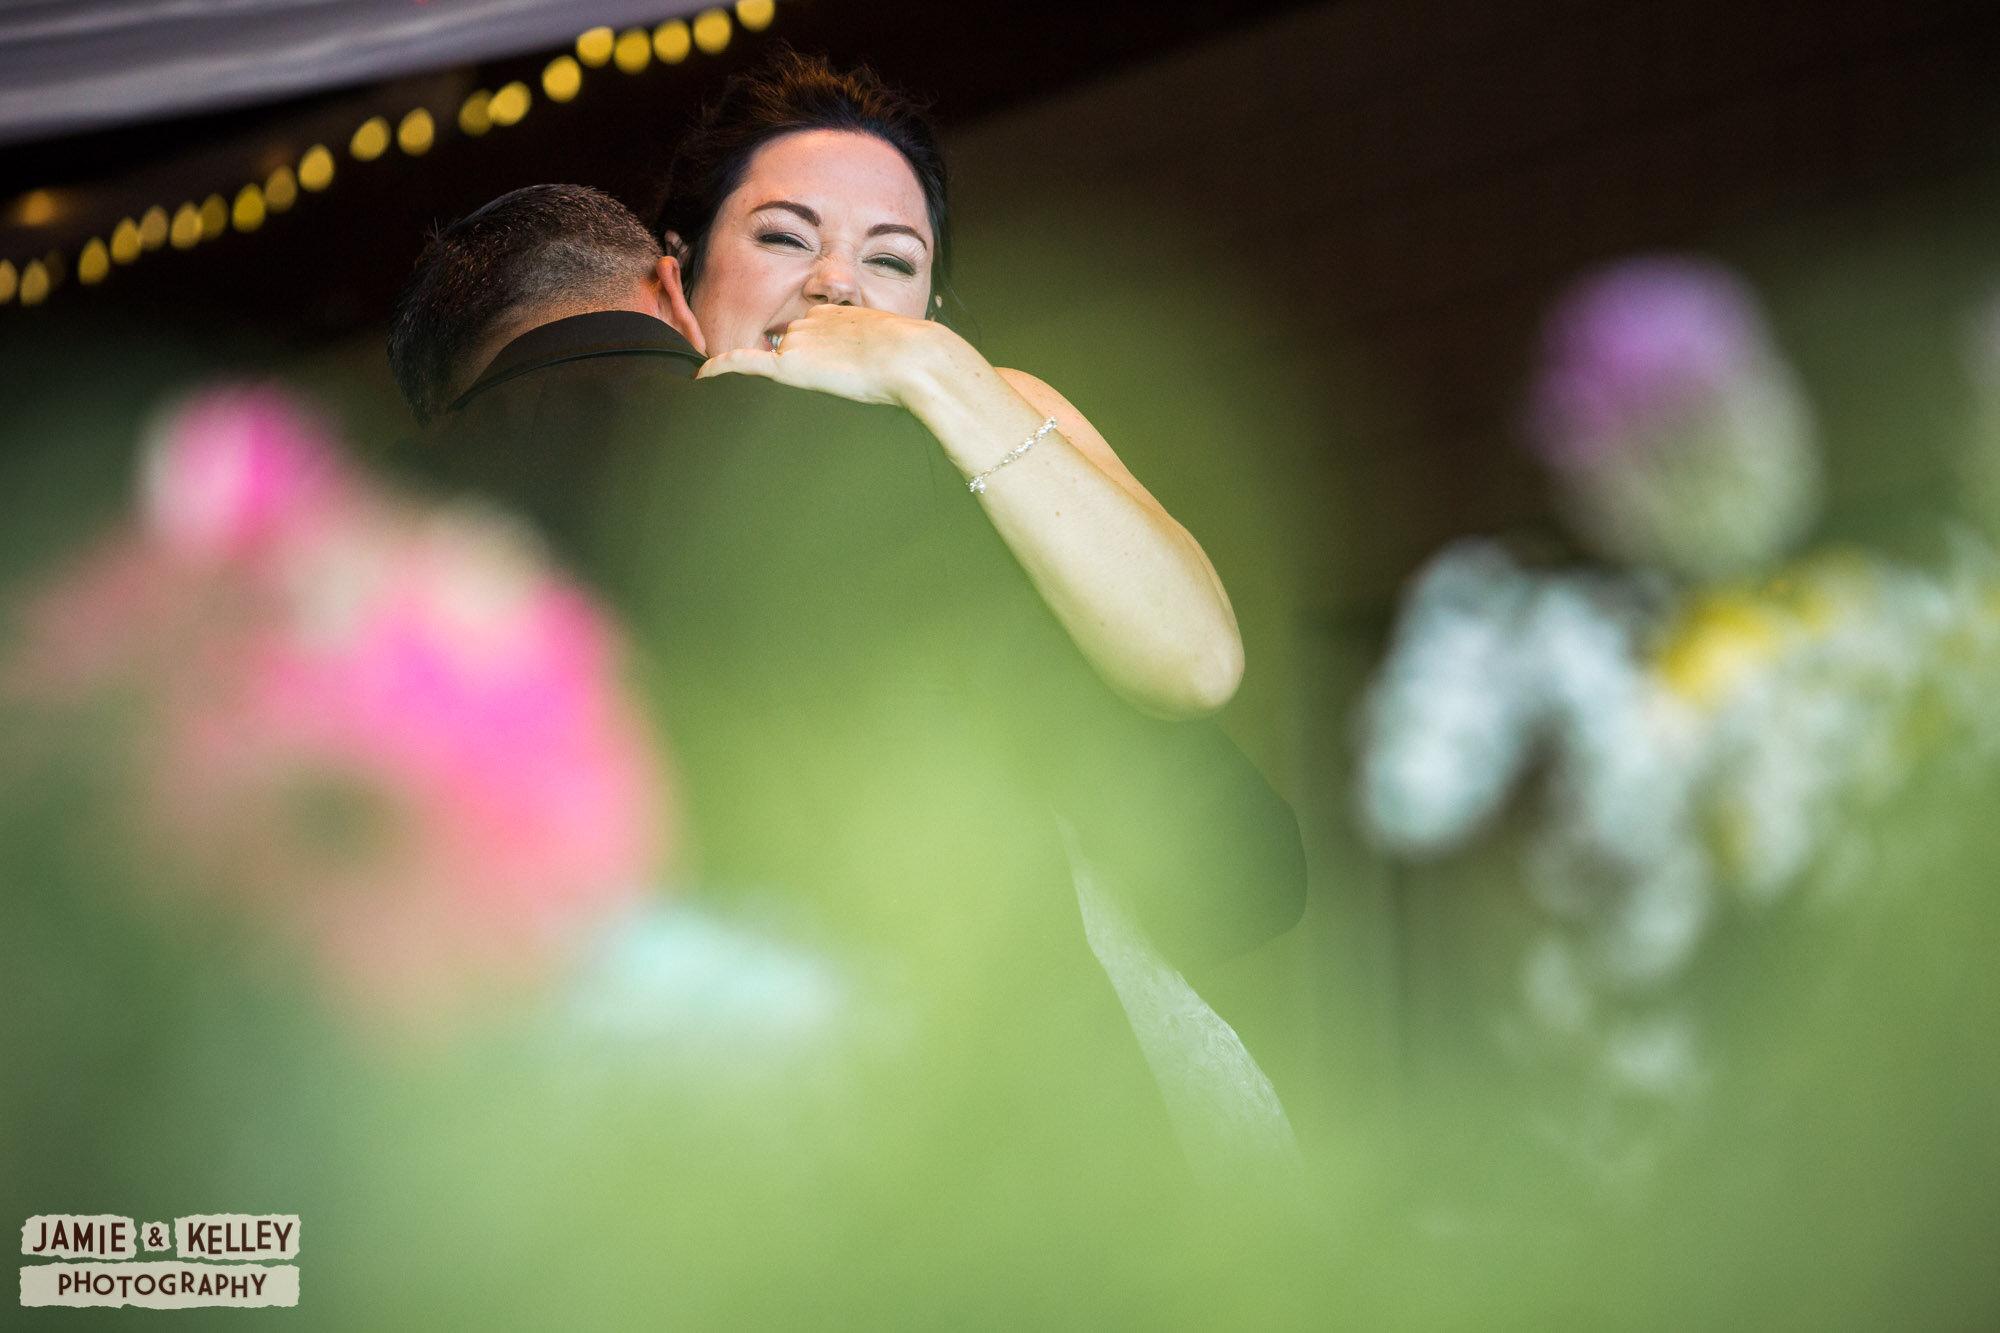 JK_ArinAndIsrael_WeddingTeasers_SprucedUp-02.jpg